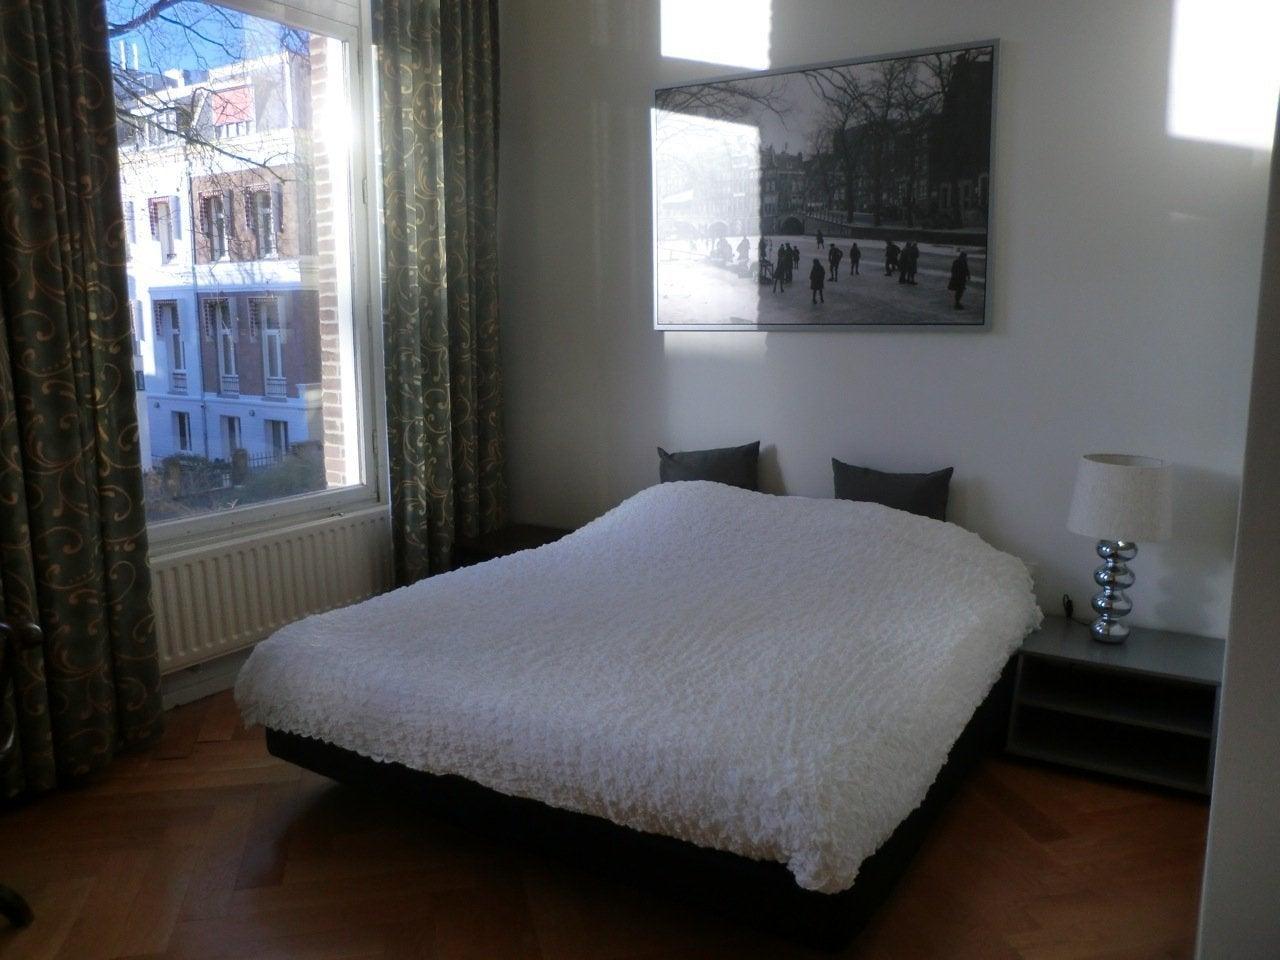 https://public.parariusoffice.nl/15/photos/huge/1789.1419415170-973.jpeg